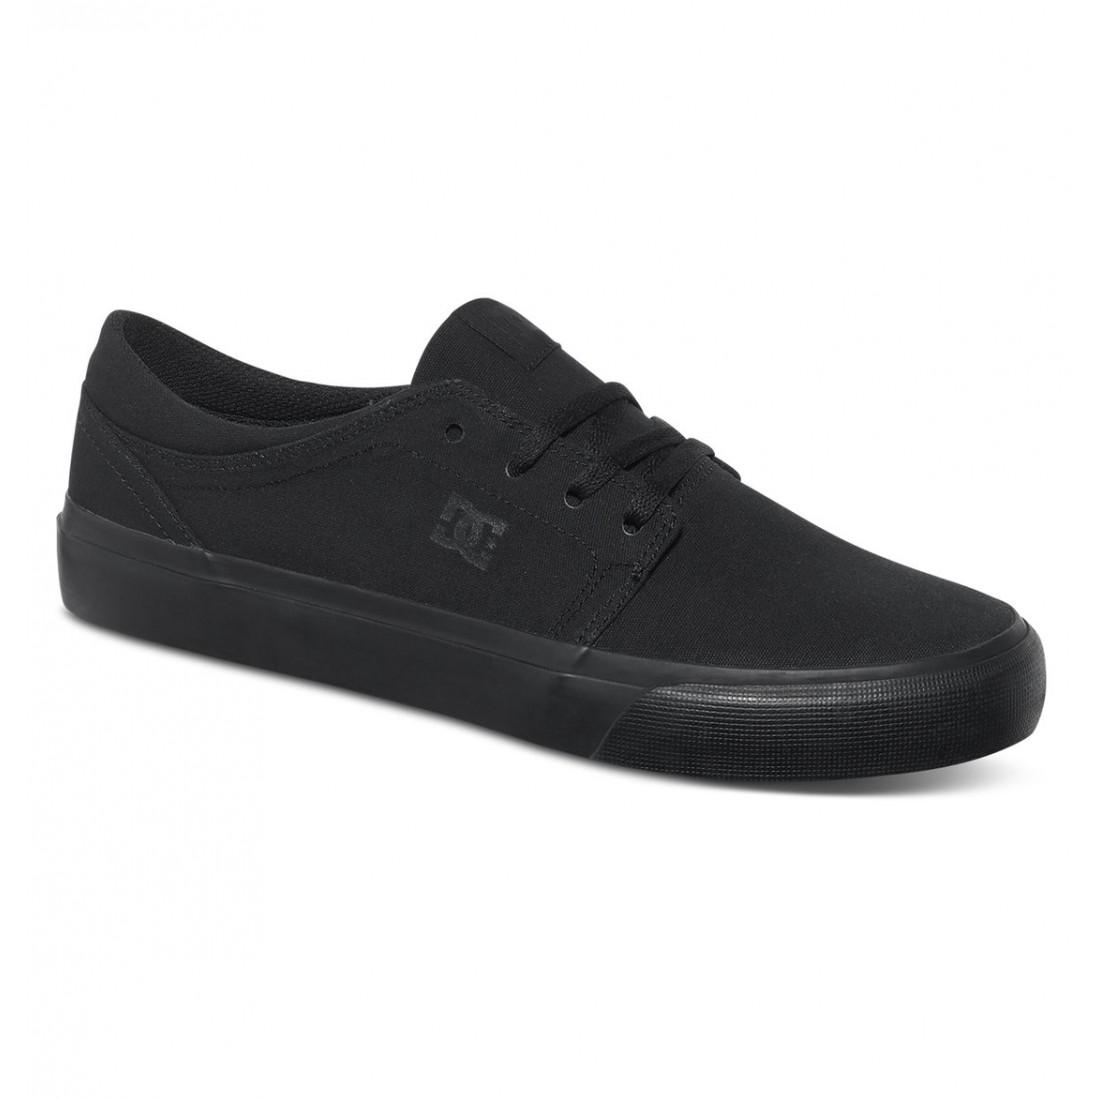 TRASE TX black black